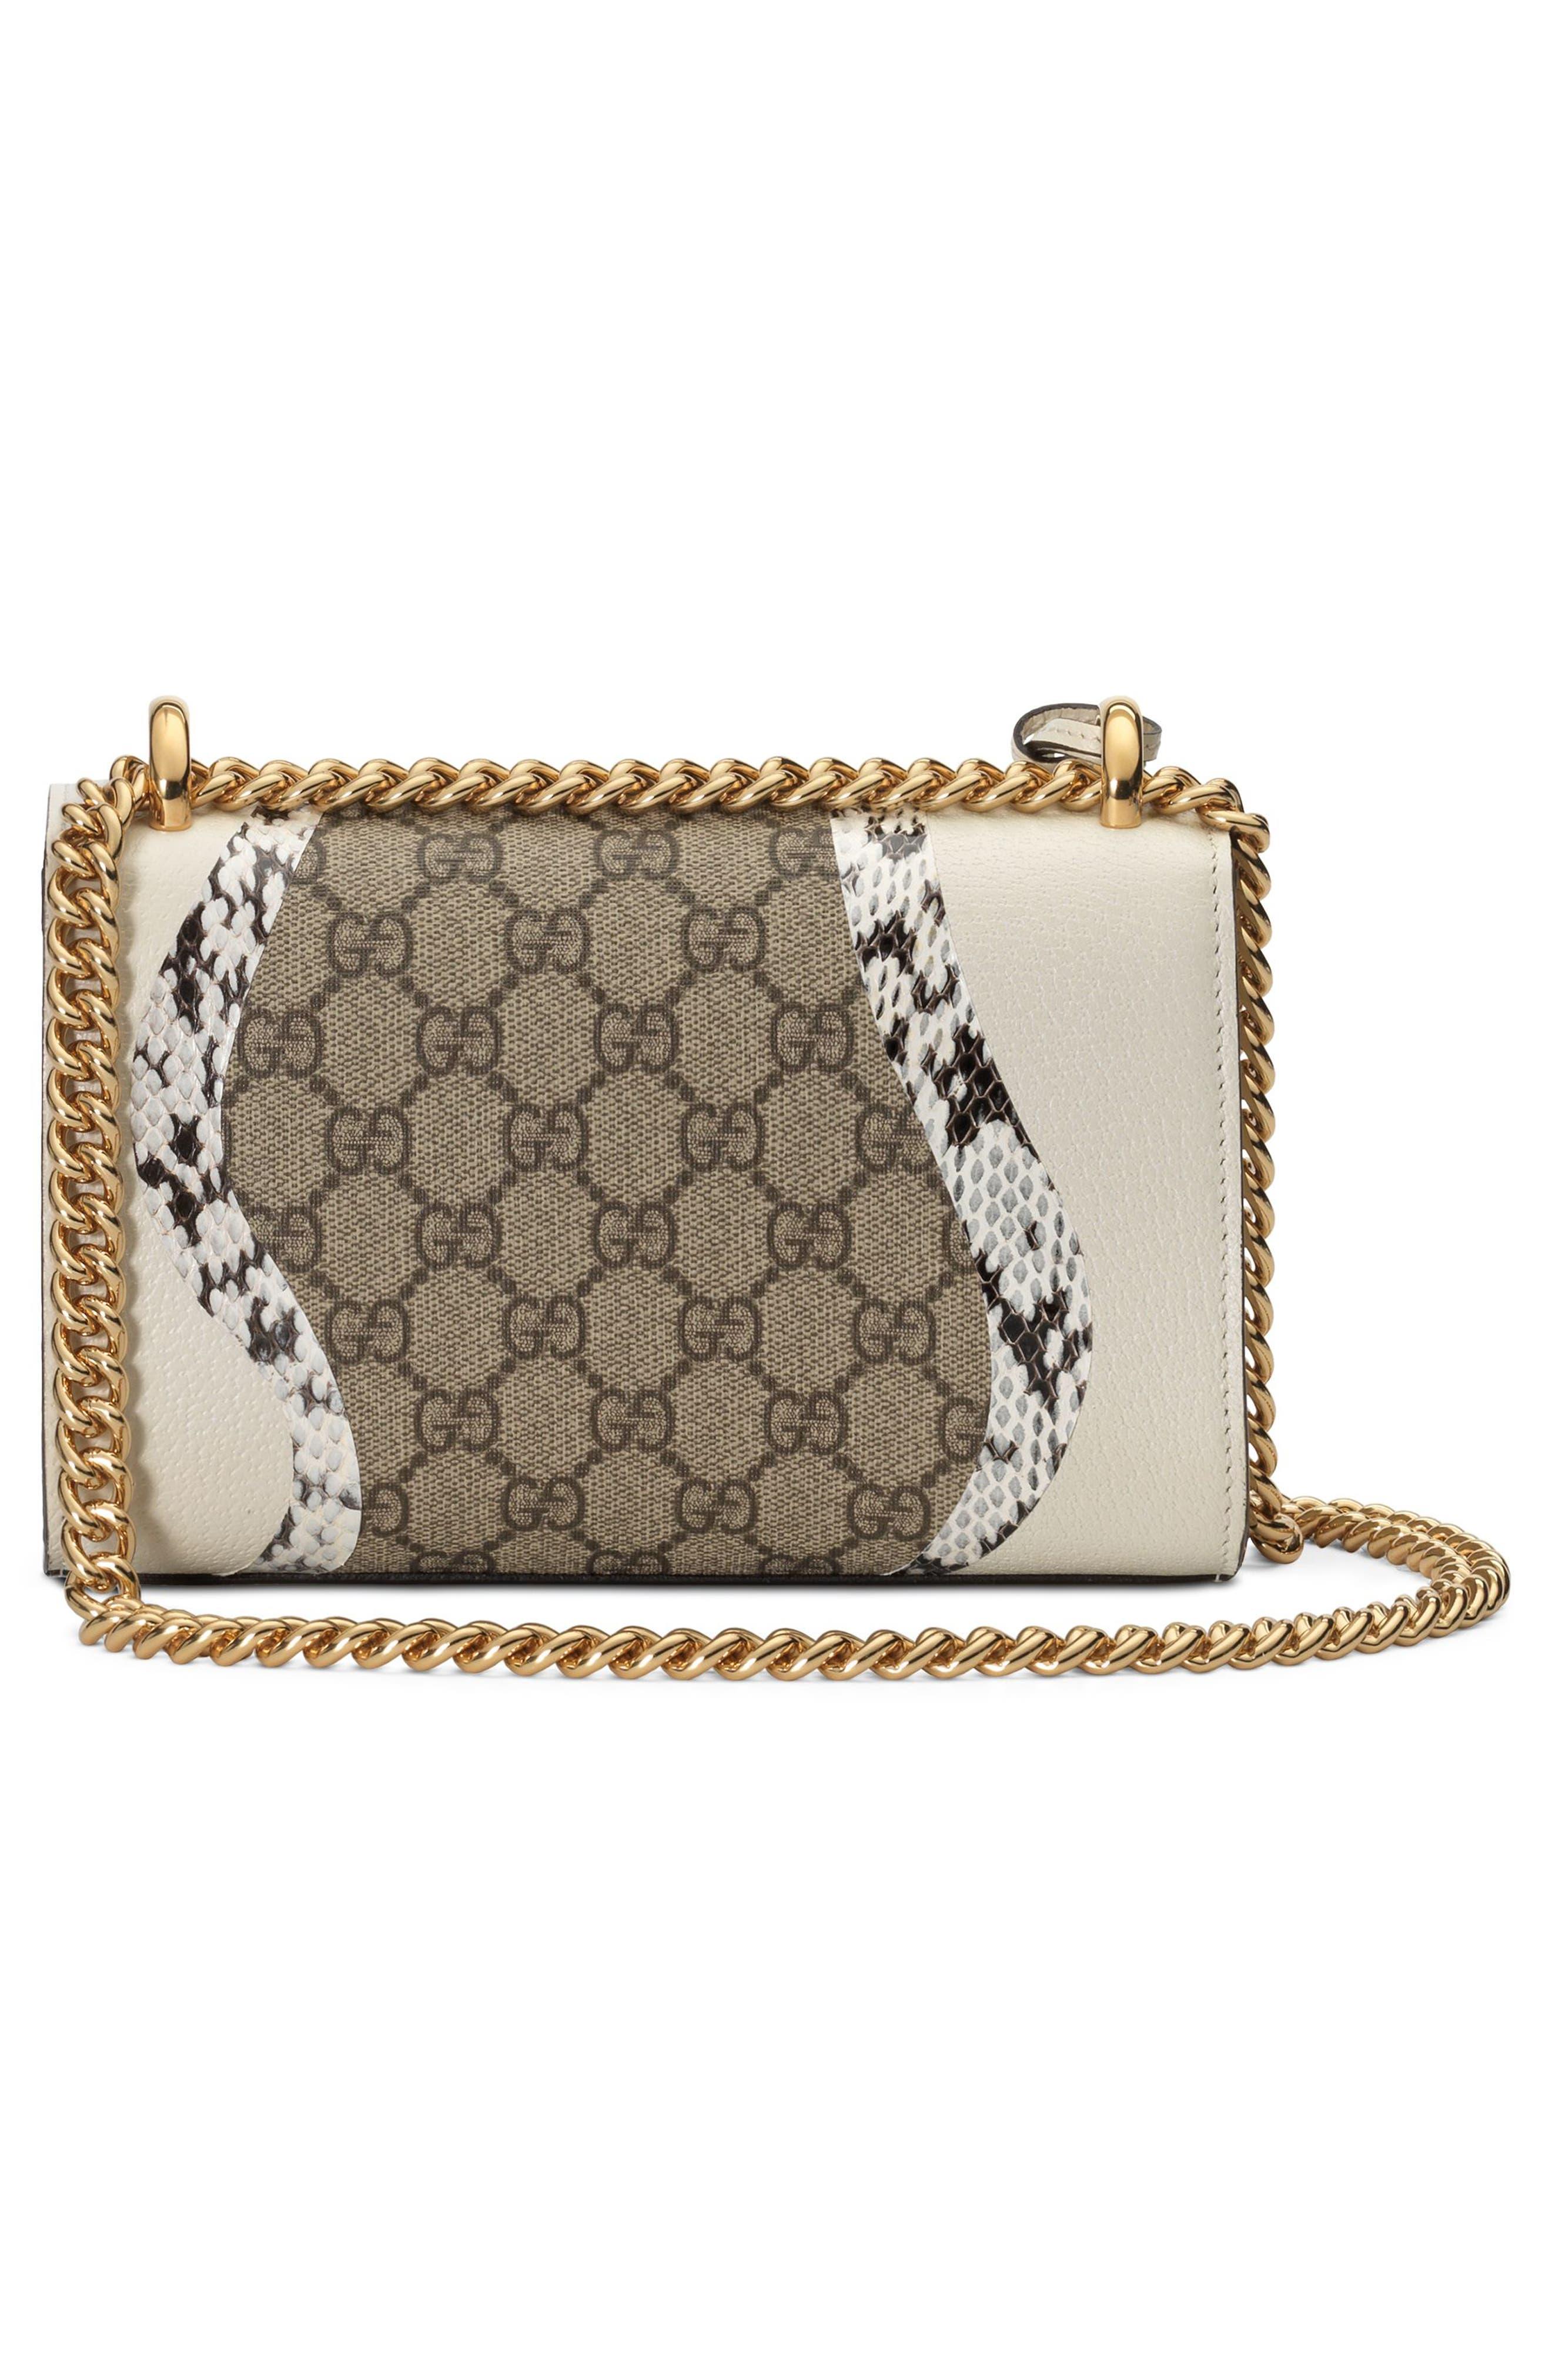 Small Padlock GG Supreme Wave Shoulder Bag with Genuine Snakeskin Trim,                             Alternate thumbnail 2, color,                             White/ Roccia/ Beige Ebony